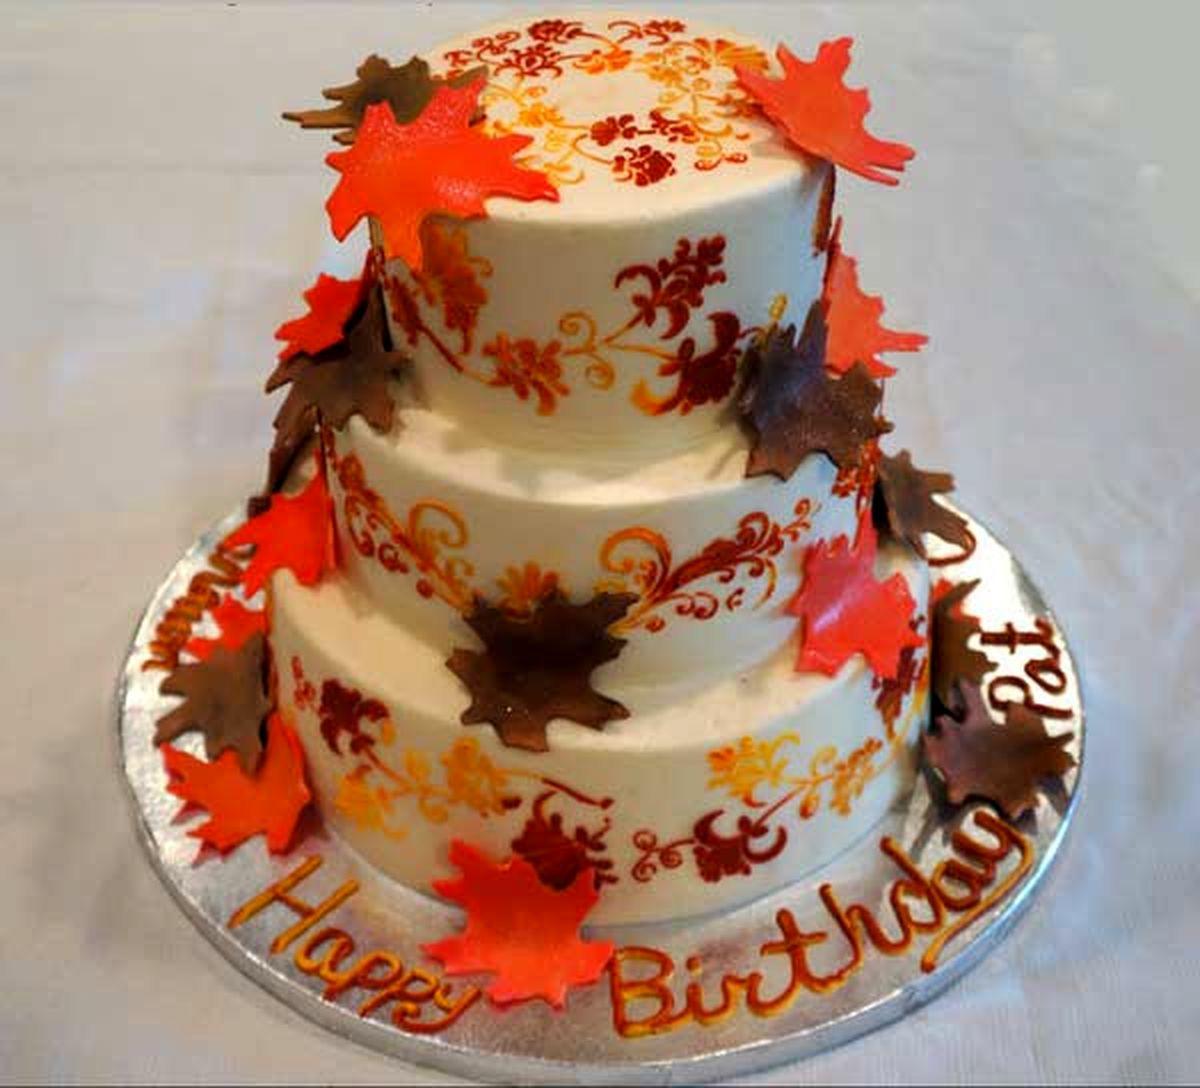 عکس کیک تولد متولدین مهر